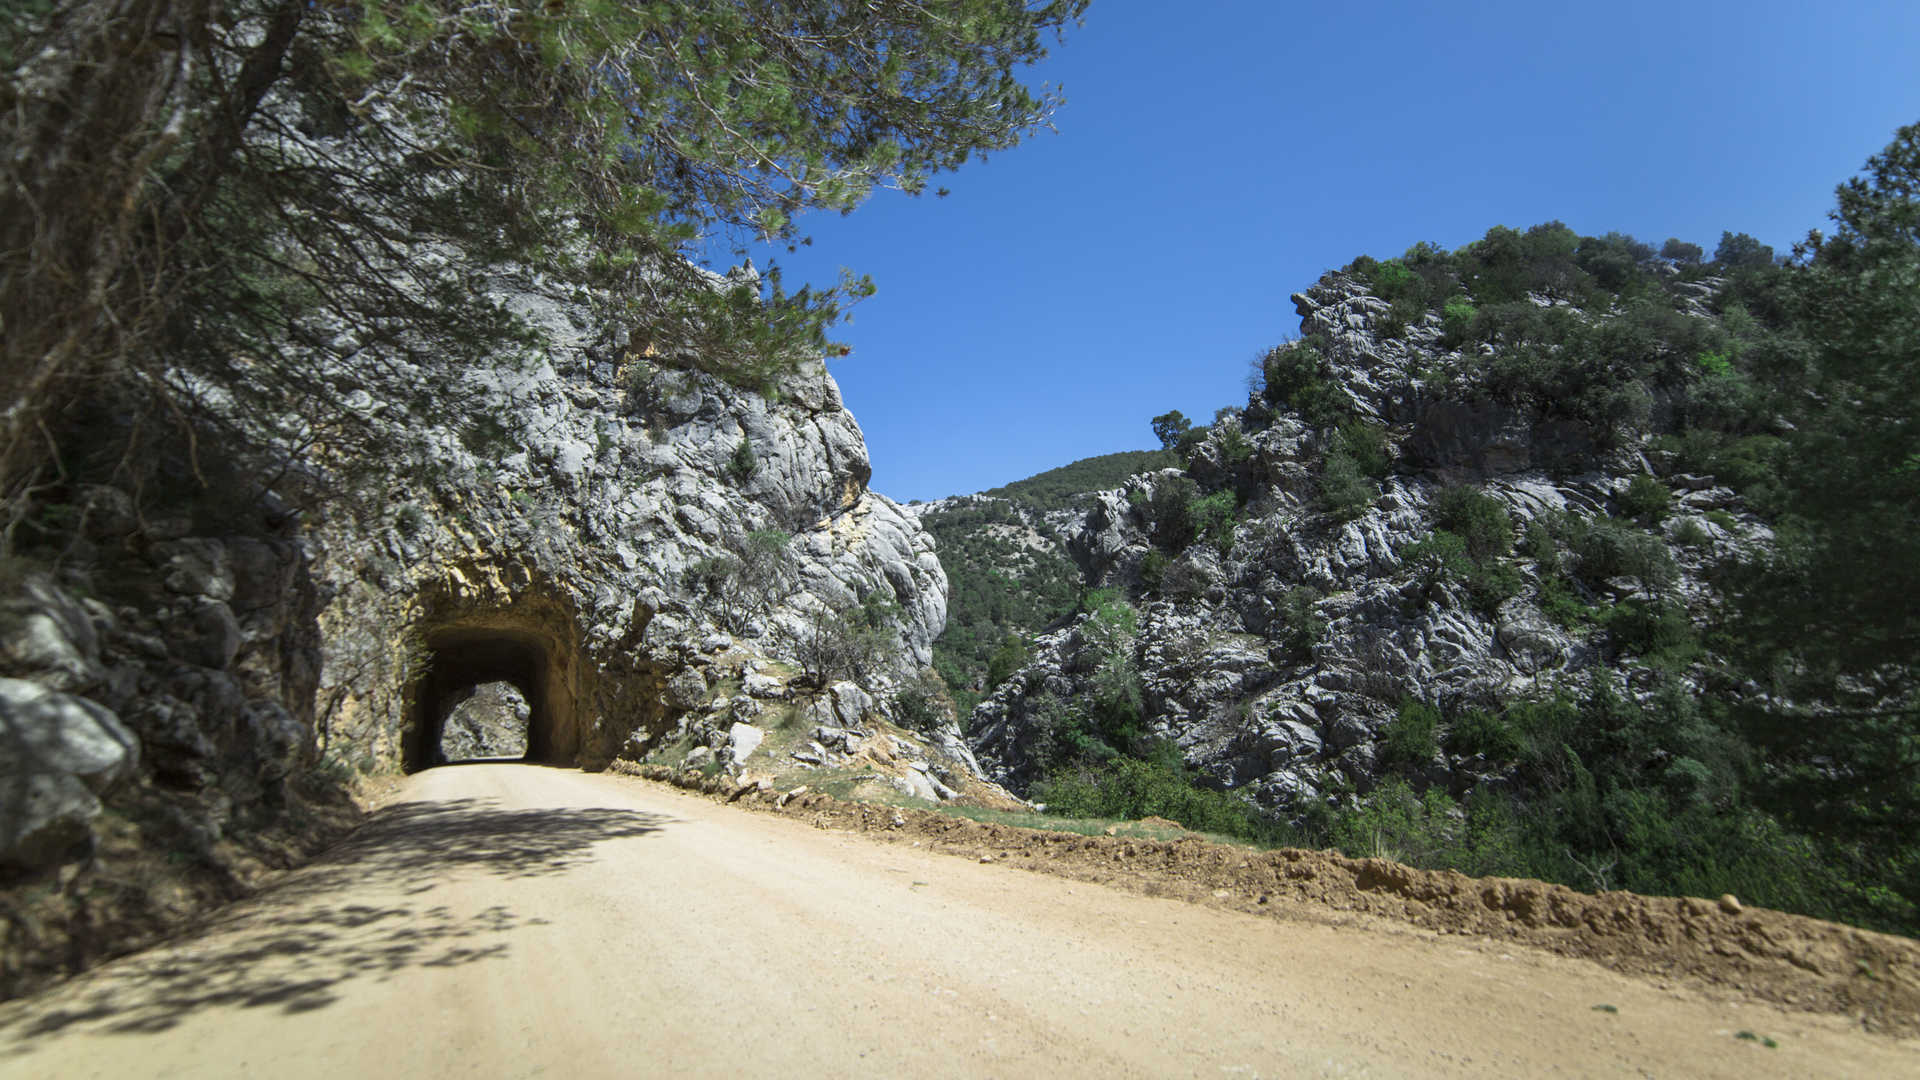 https://multimedia.andalucia.org/media/5E2F1D757B7446FCA3CAC98E8D3BAAC7/img/4DB349B7F8024F5C89178EF791259926/6-4_Camino_hacia_el_nacimiento_del_Guadalquivir_Sierra_de_Cazorla_Jaen.jpg?responsive